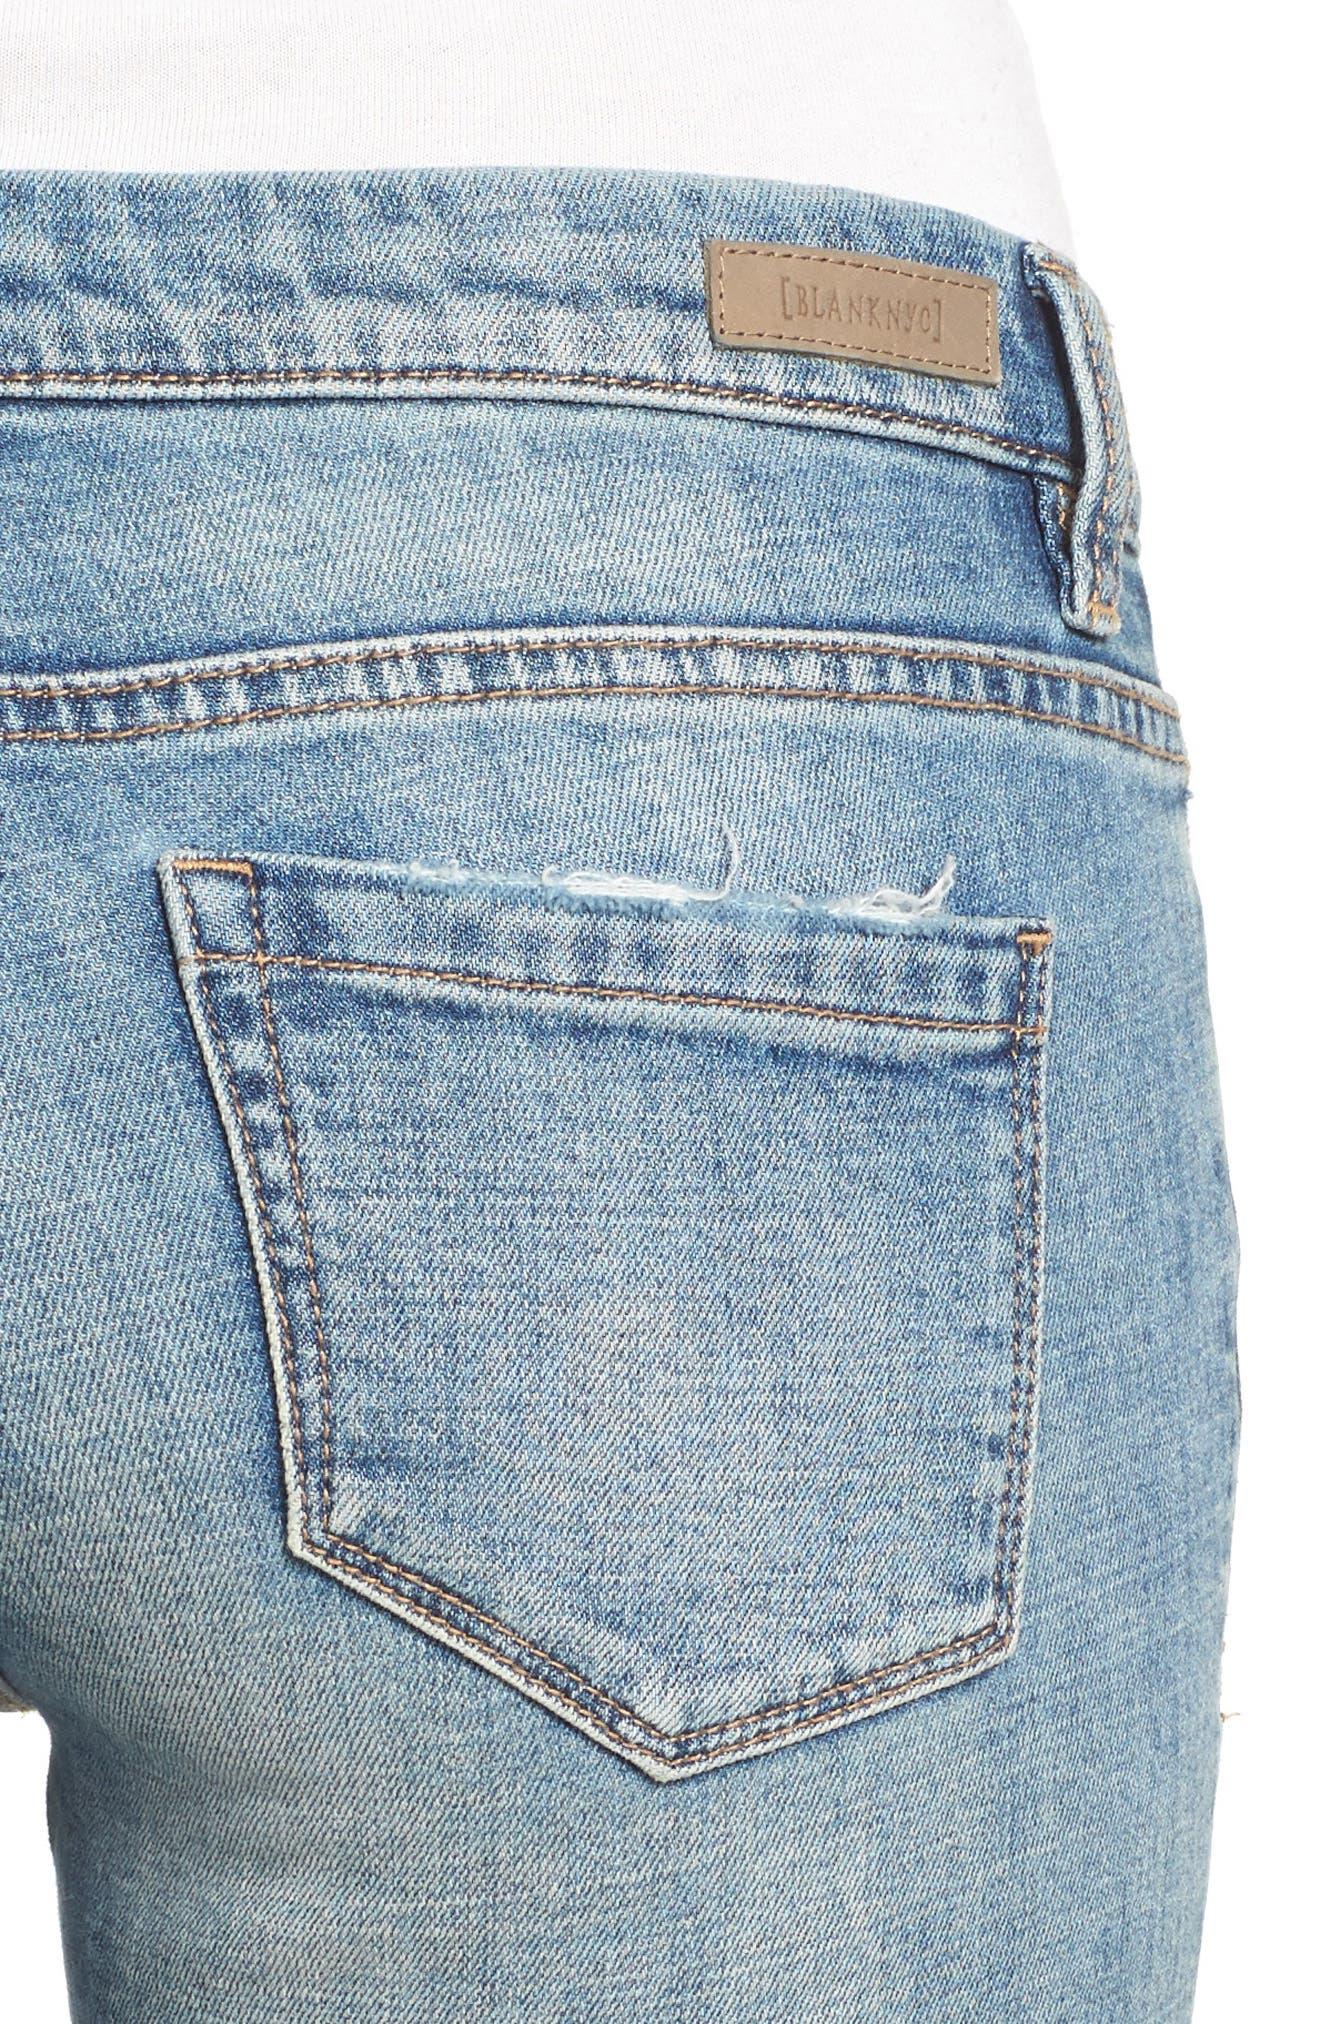 Alternate Image 4  - BLANKNYC Lost & Found Cuffed Straight Leg Jeans